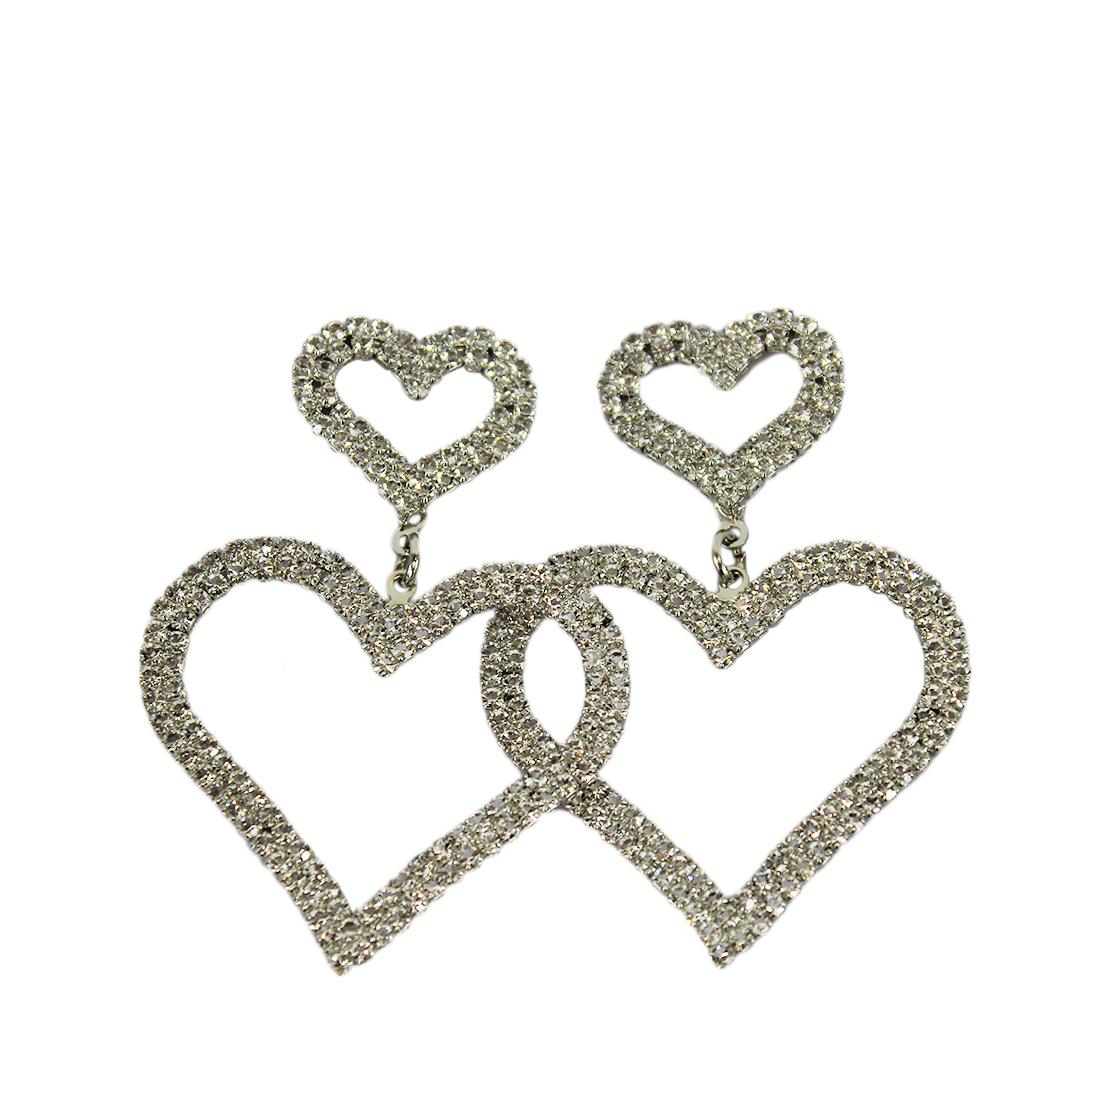 Double Heart With Diamonds Design